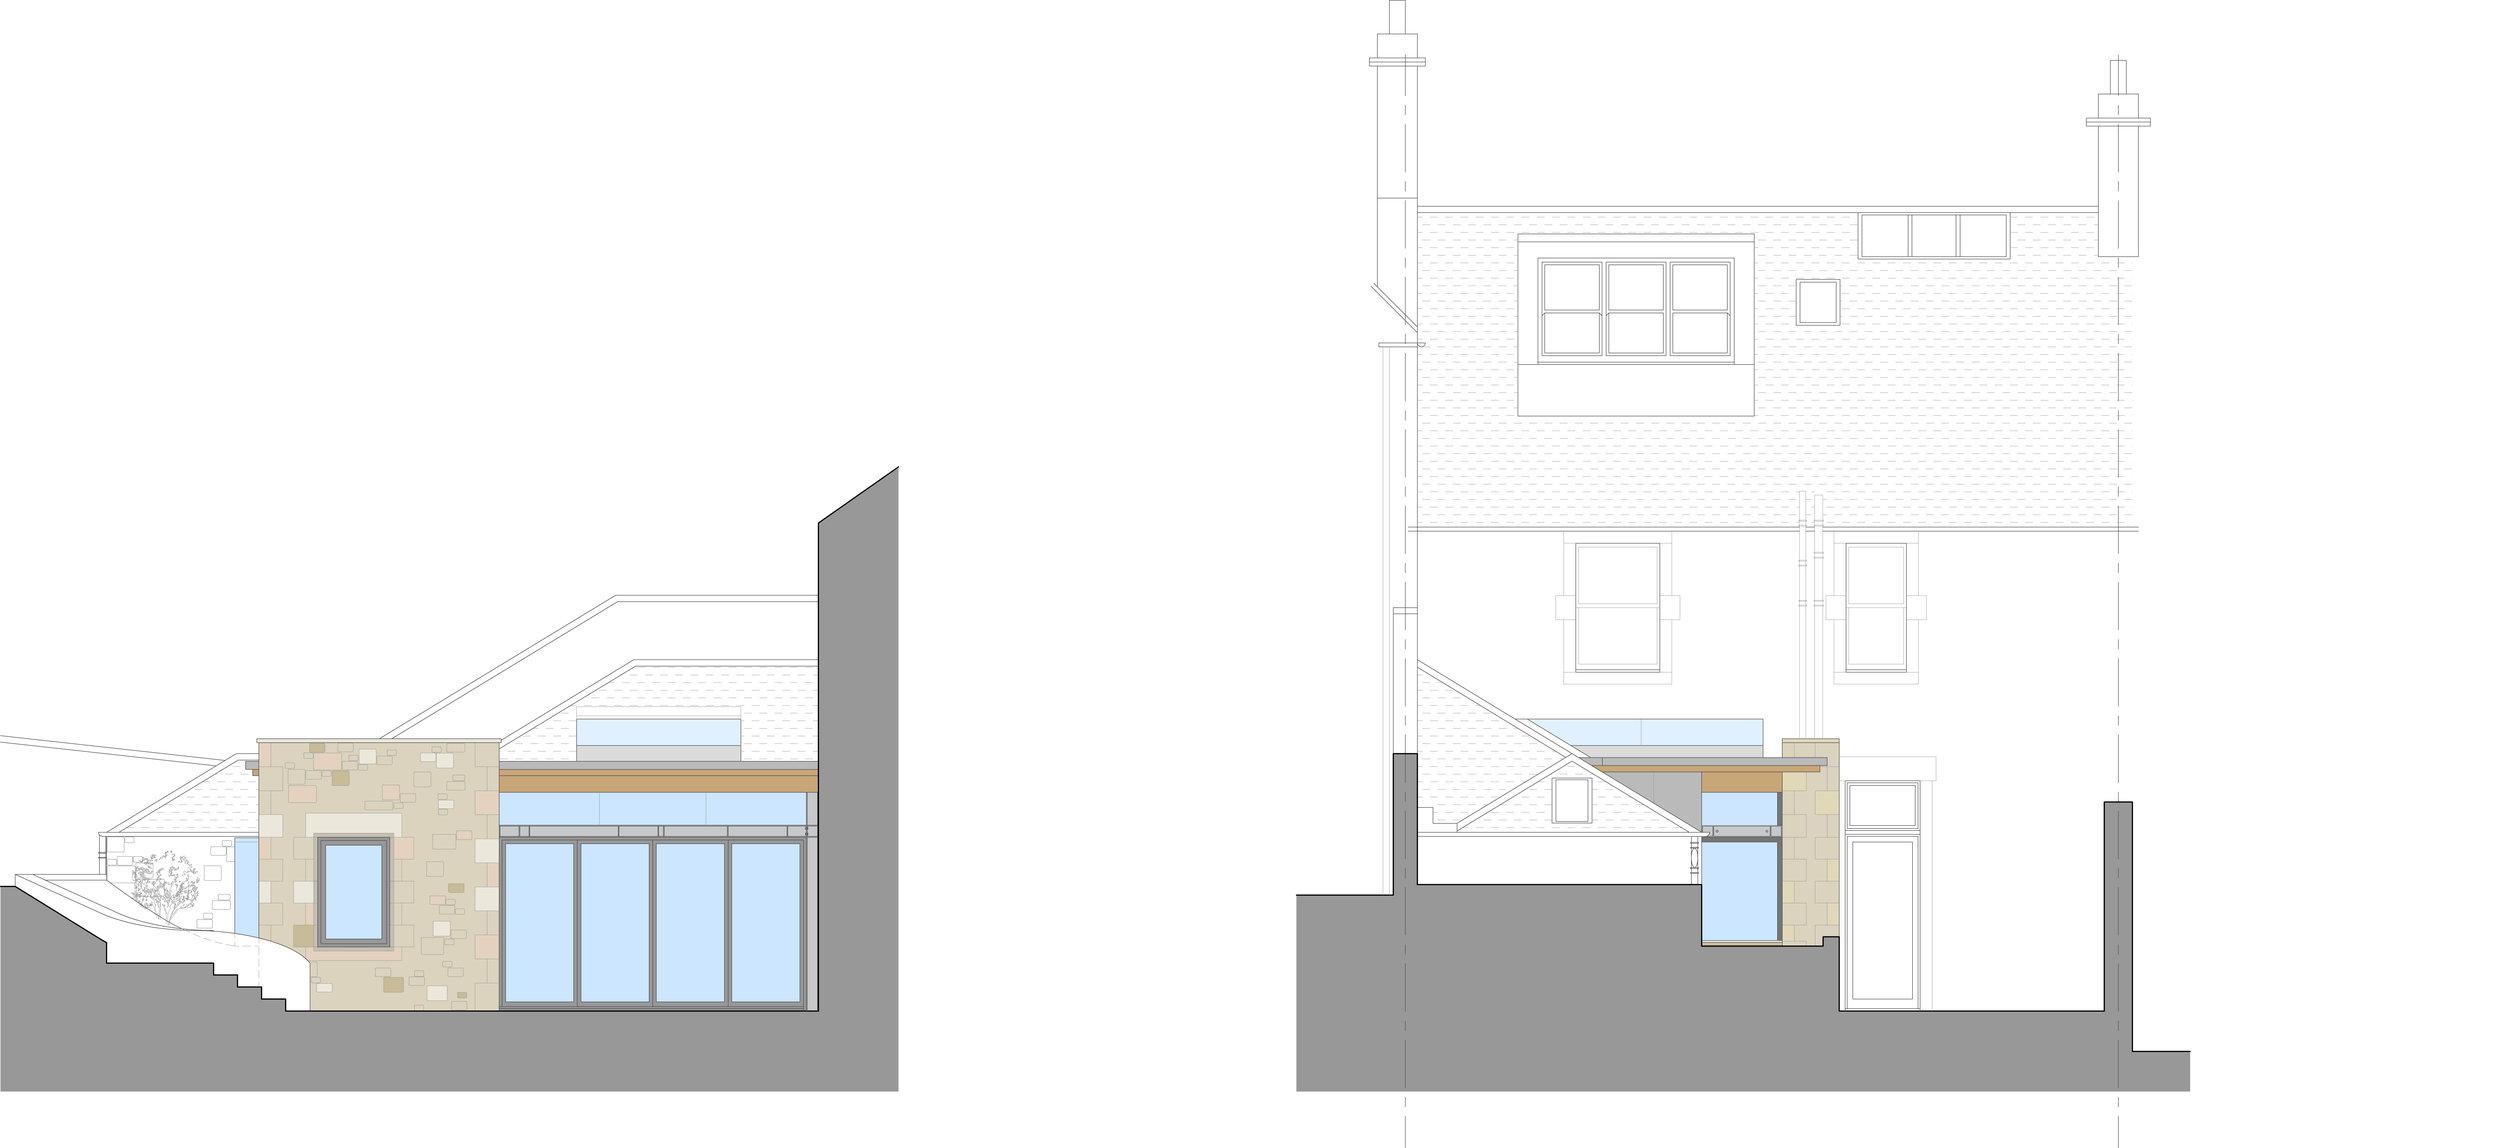 David Blaikie Architects Coltbridge Terrace Elevation.jpg